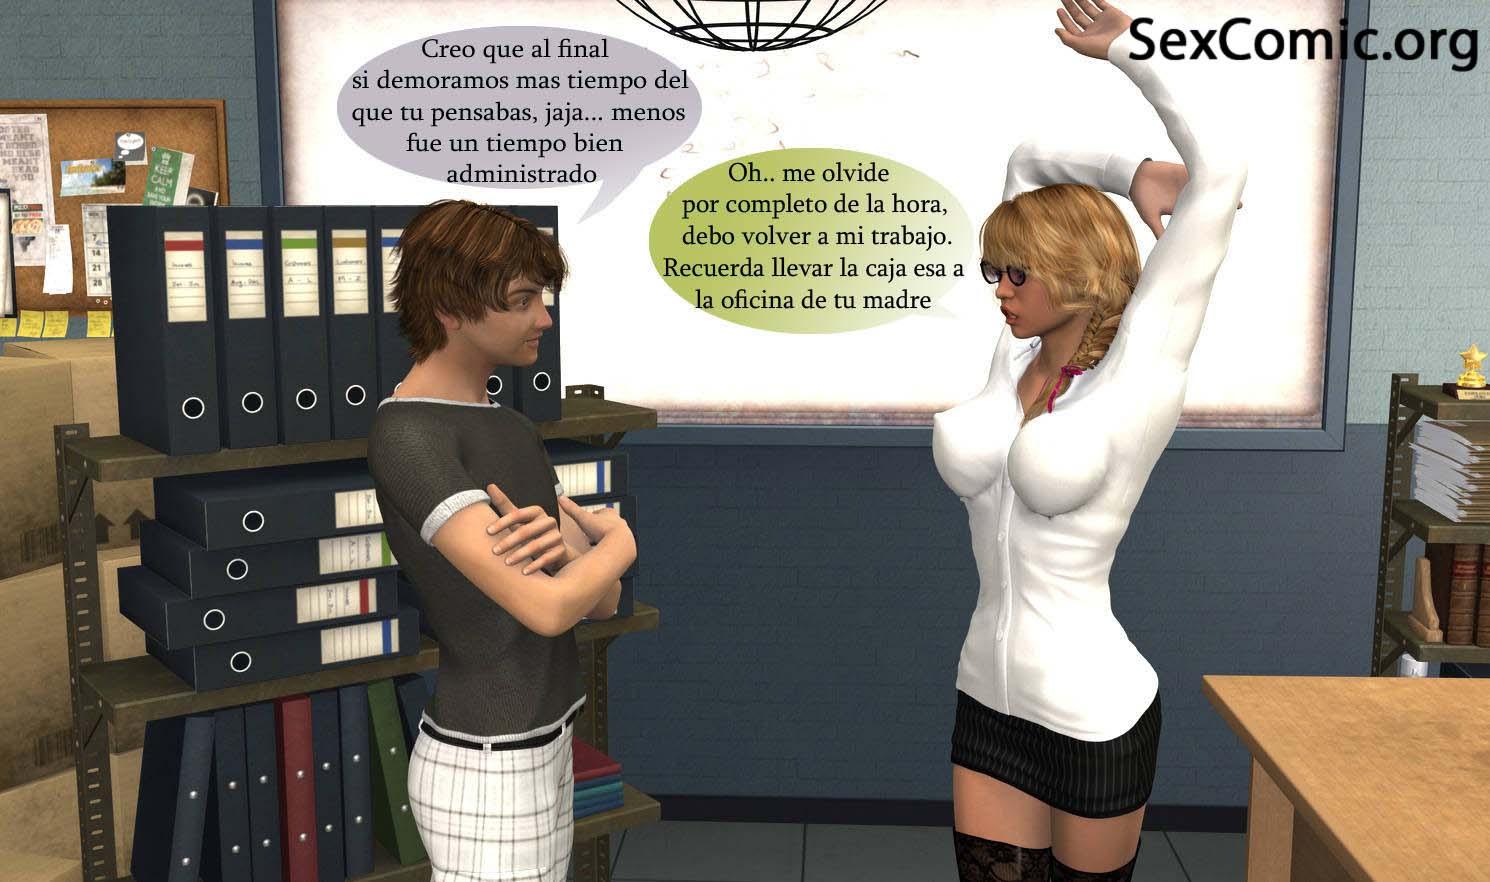 comic-xxx-3d-seduciendo-alas-empleadas-de-mama-historias-sexuales-mangas-para-adultos-videos-deincesto-comics-xxx-historias-eroticas-fantacias-sexuales-gtaris-online-58